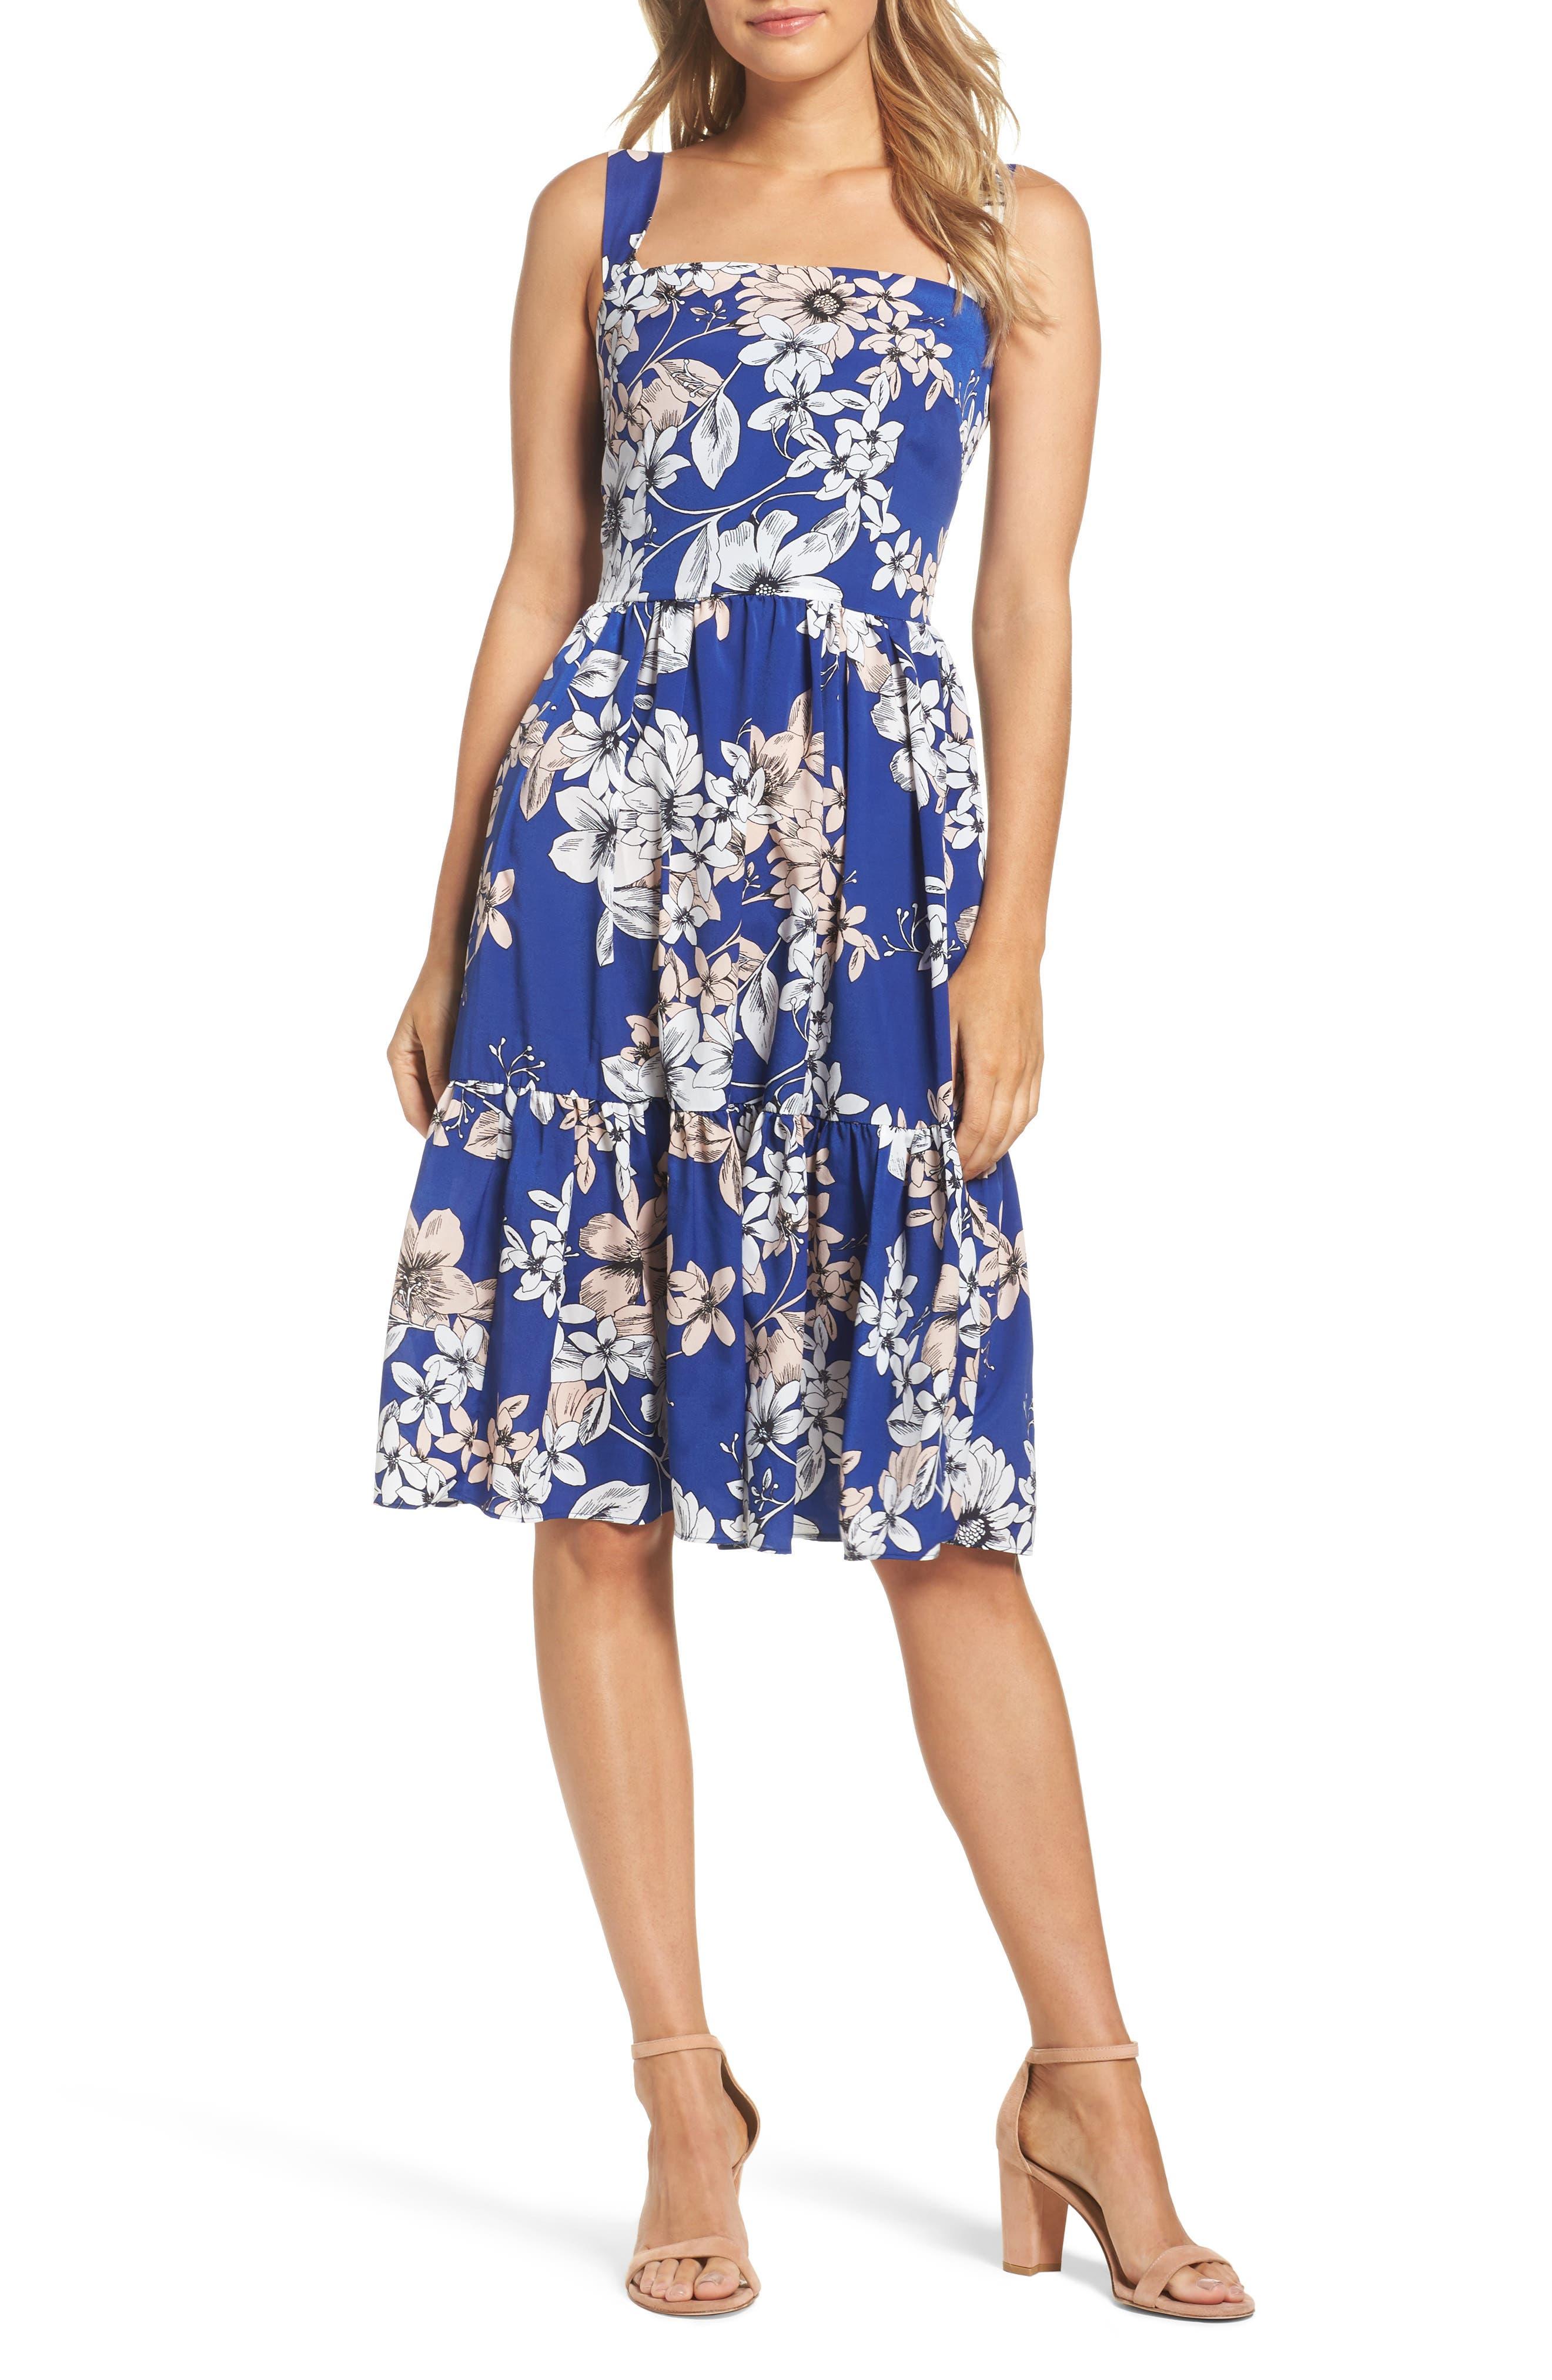 Main Image - Eliza J Floral Print Fit & Flare Dress